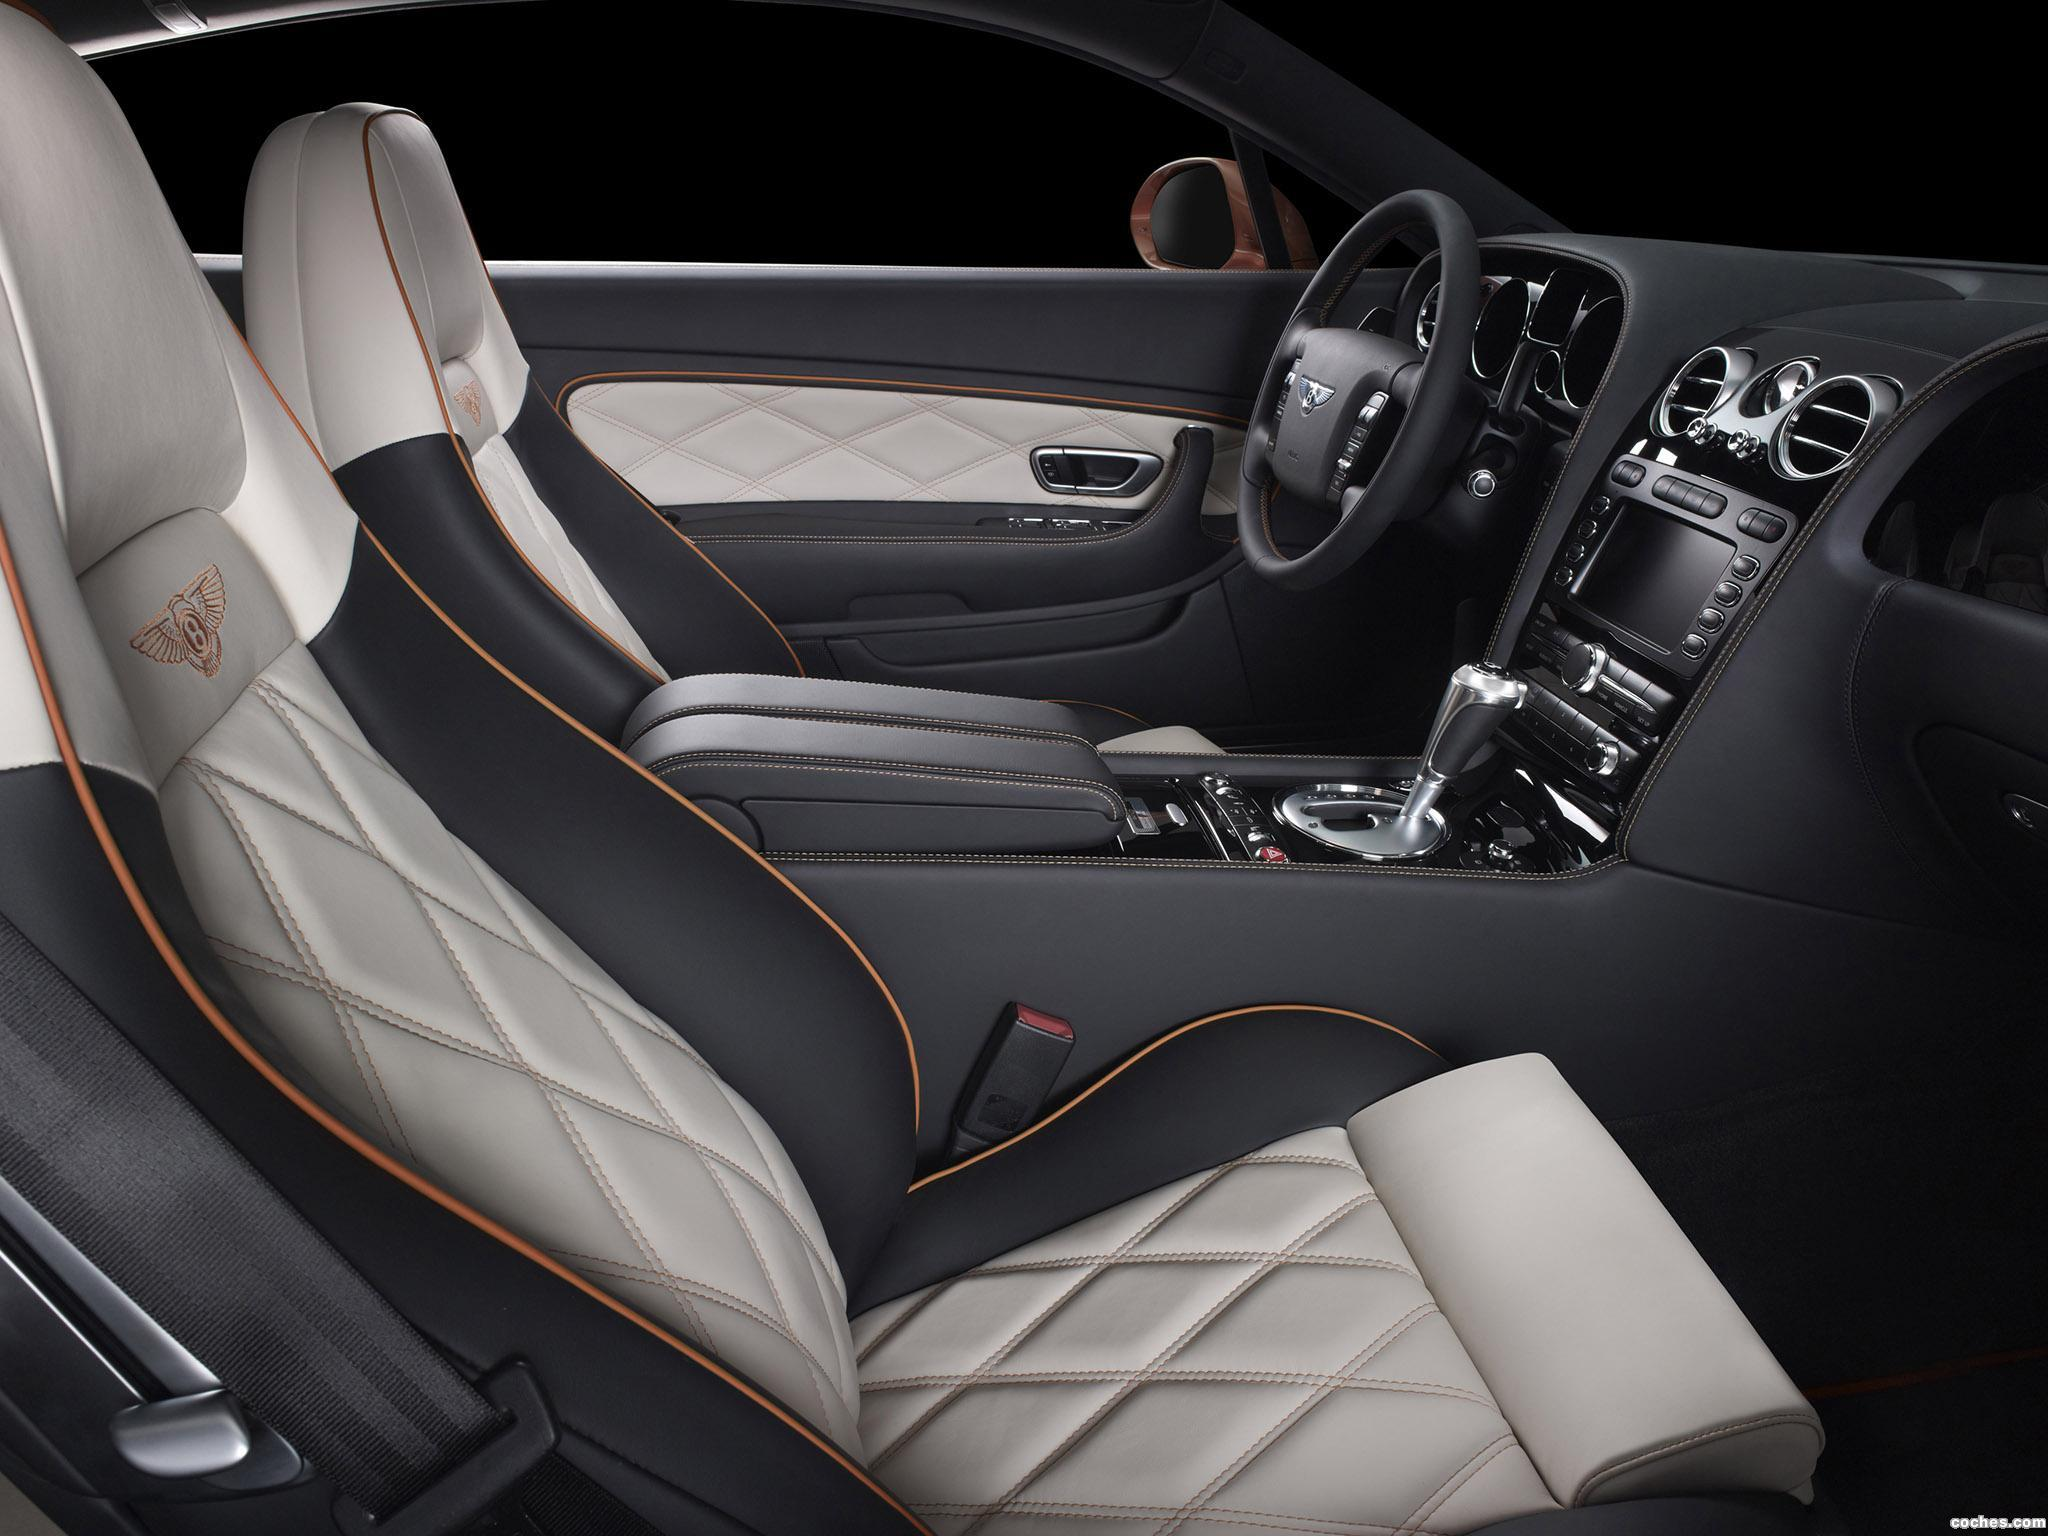 Foto 3 de Bentley esign Series China 2010